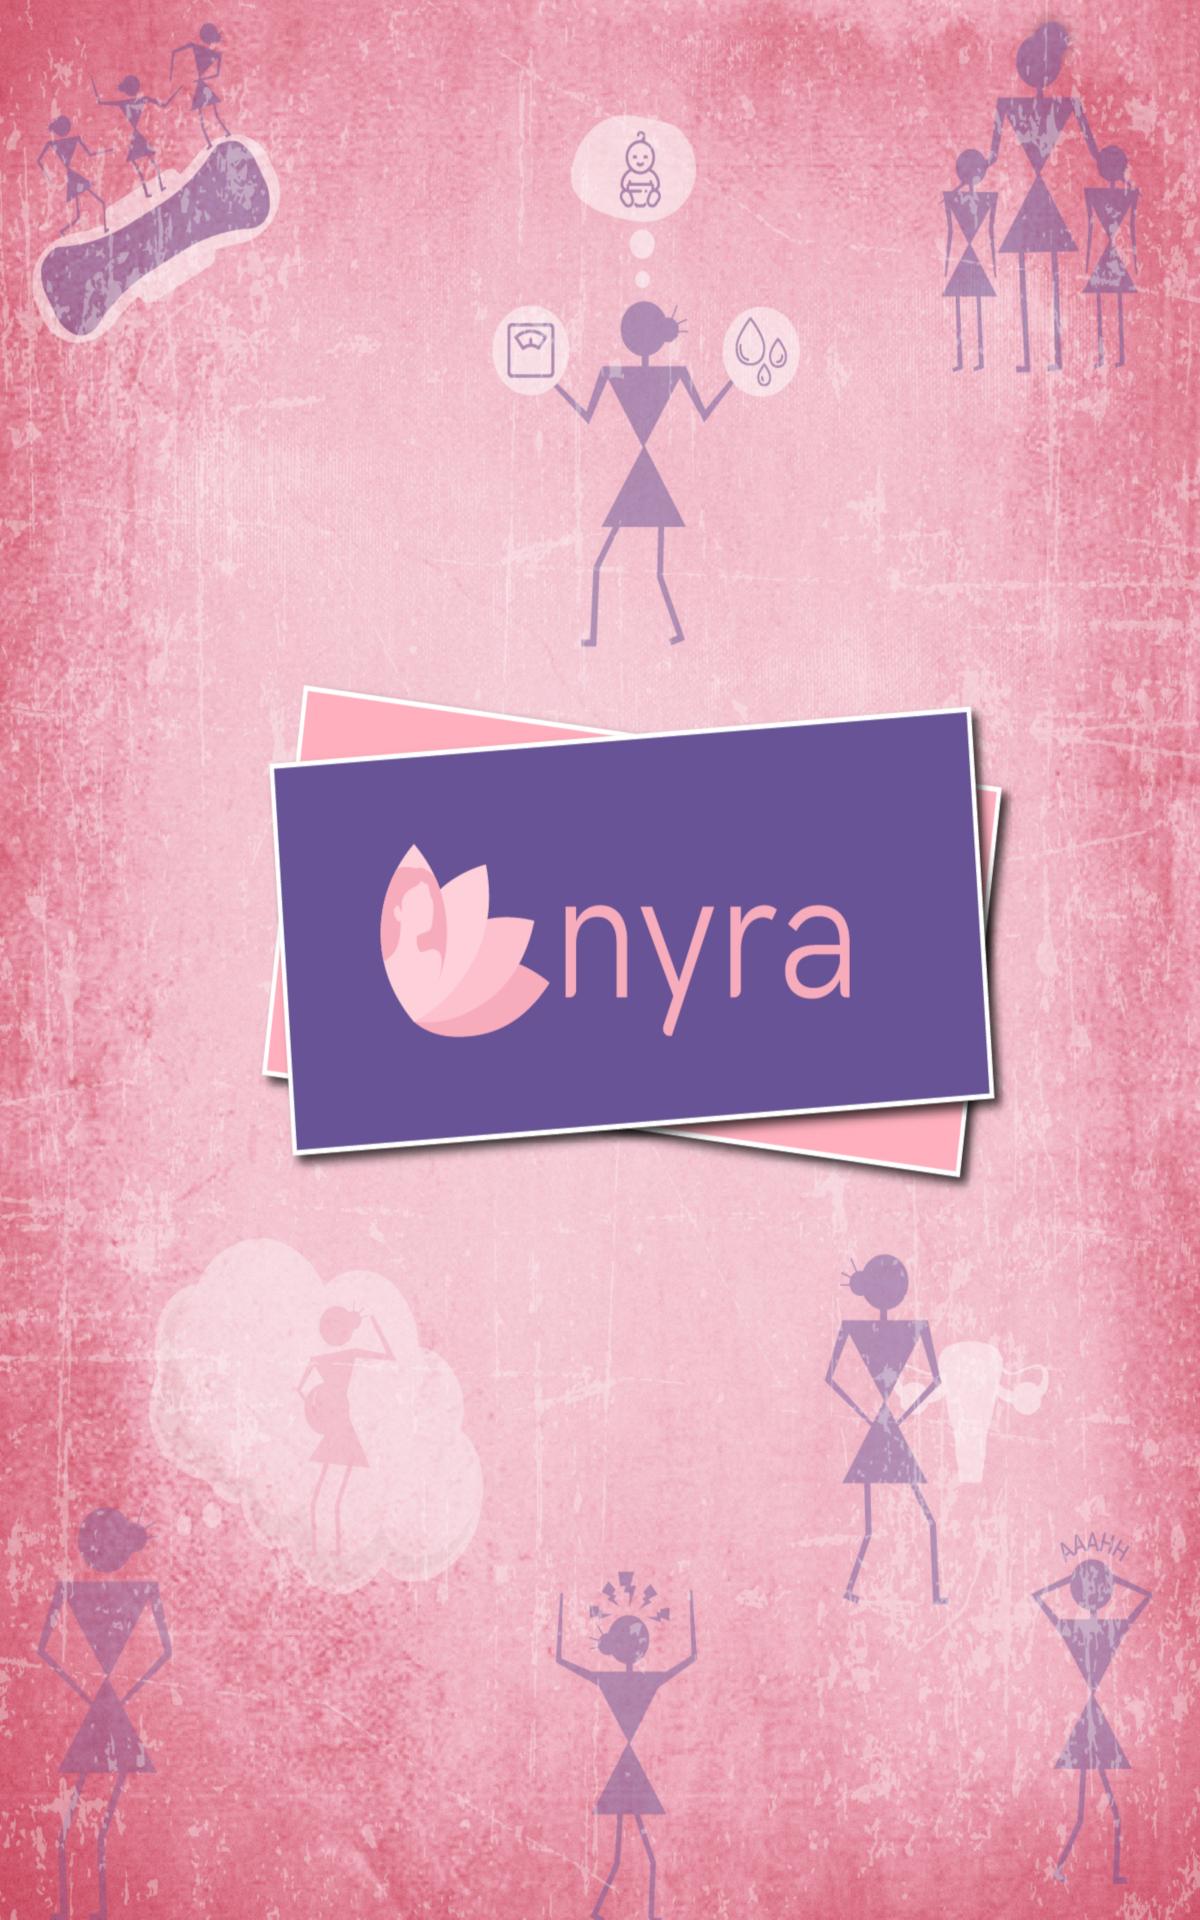 Nyra – Period, Fertility & Ovulation Tracker App